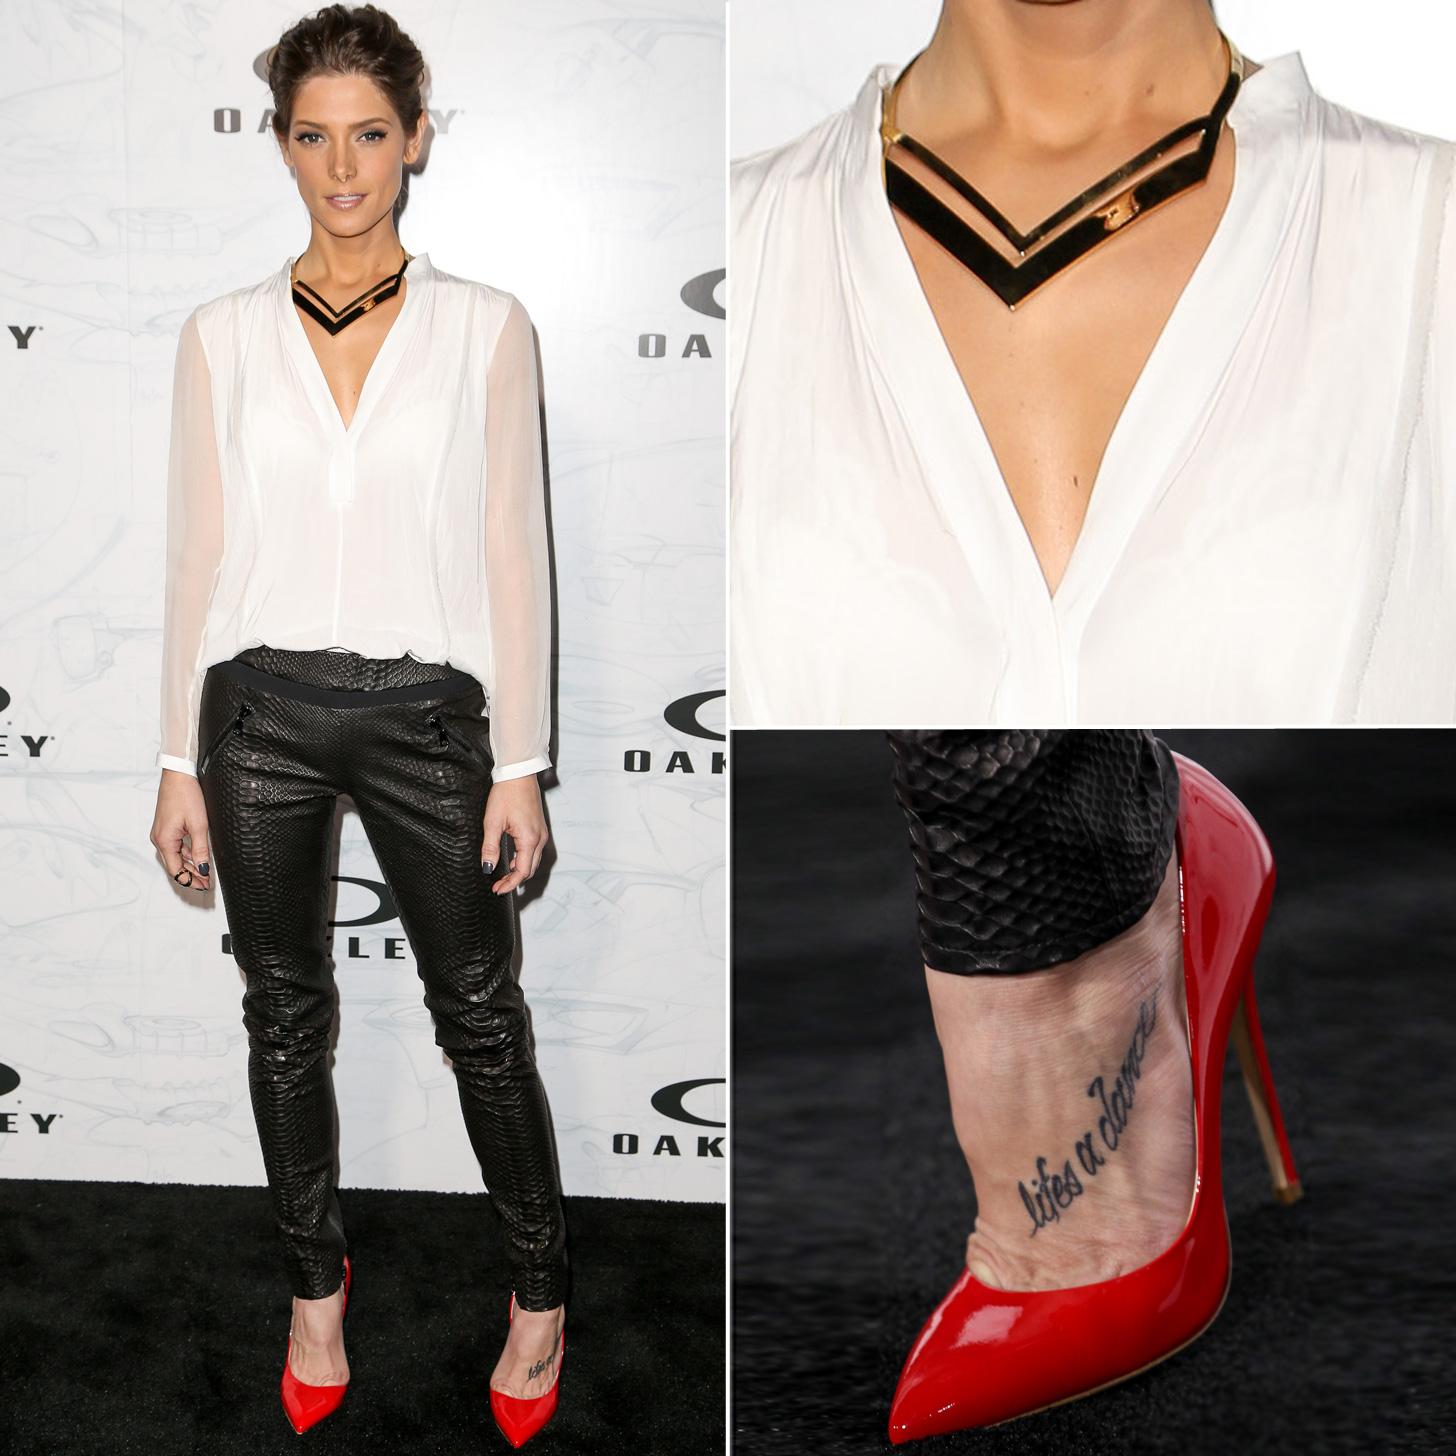 Ashley greene black snakeskin pants and white shirt outfit for White shirt black pants